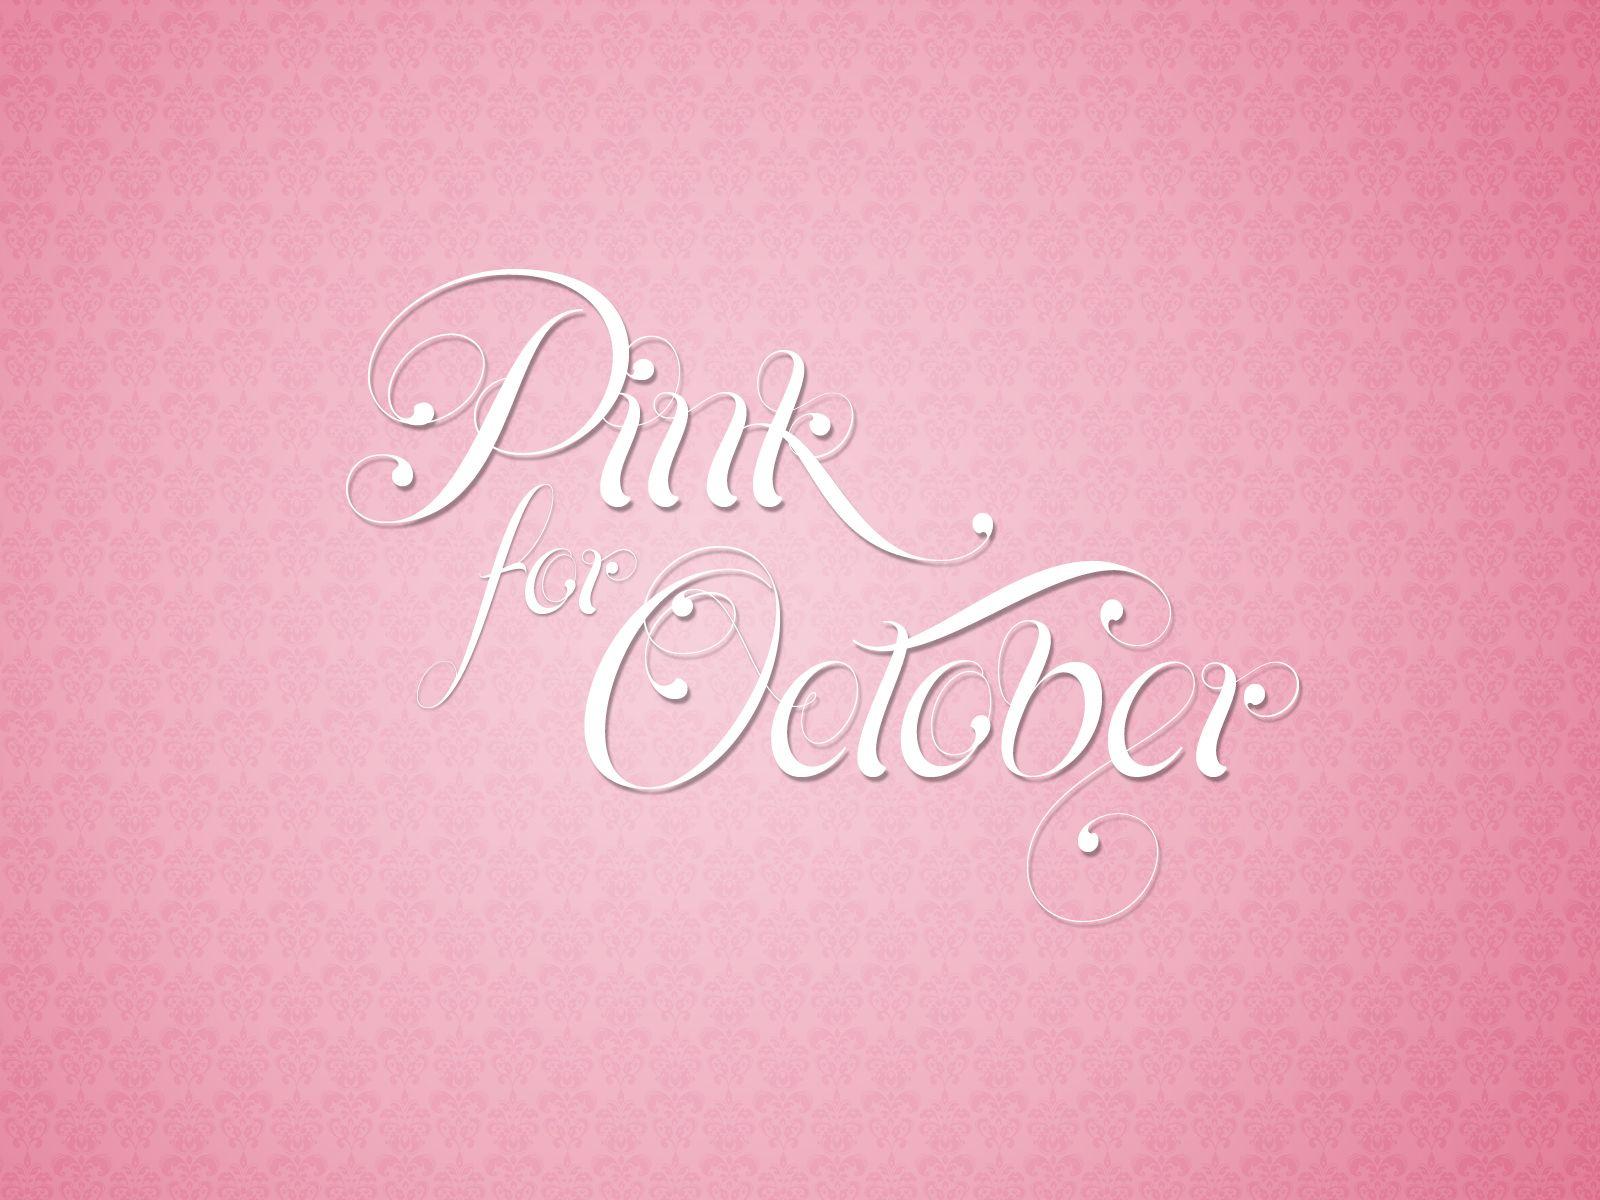 Breast Cancer Awareness Wallpaper For Facebook